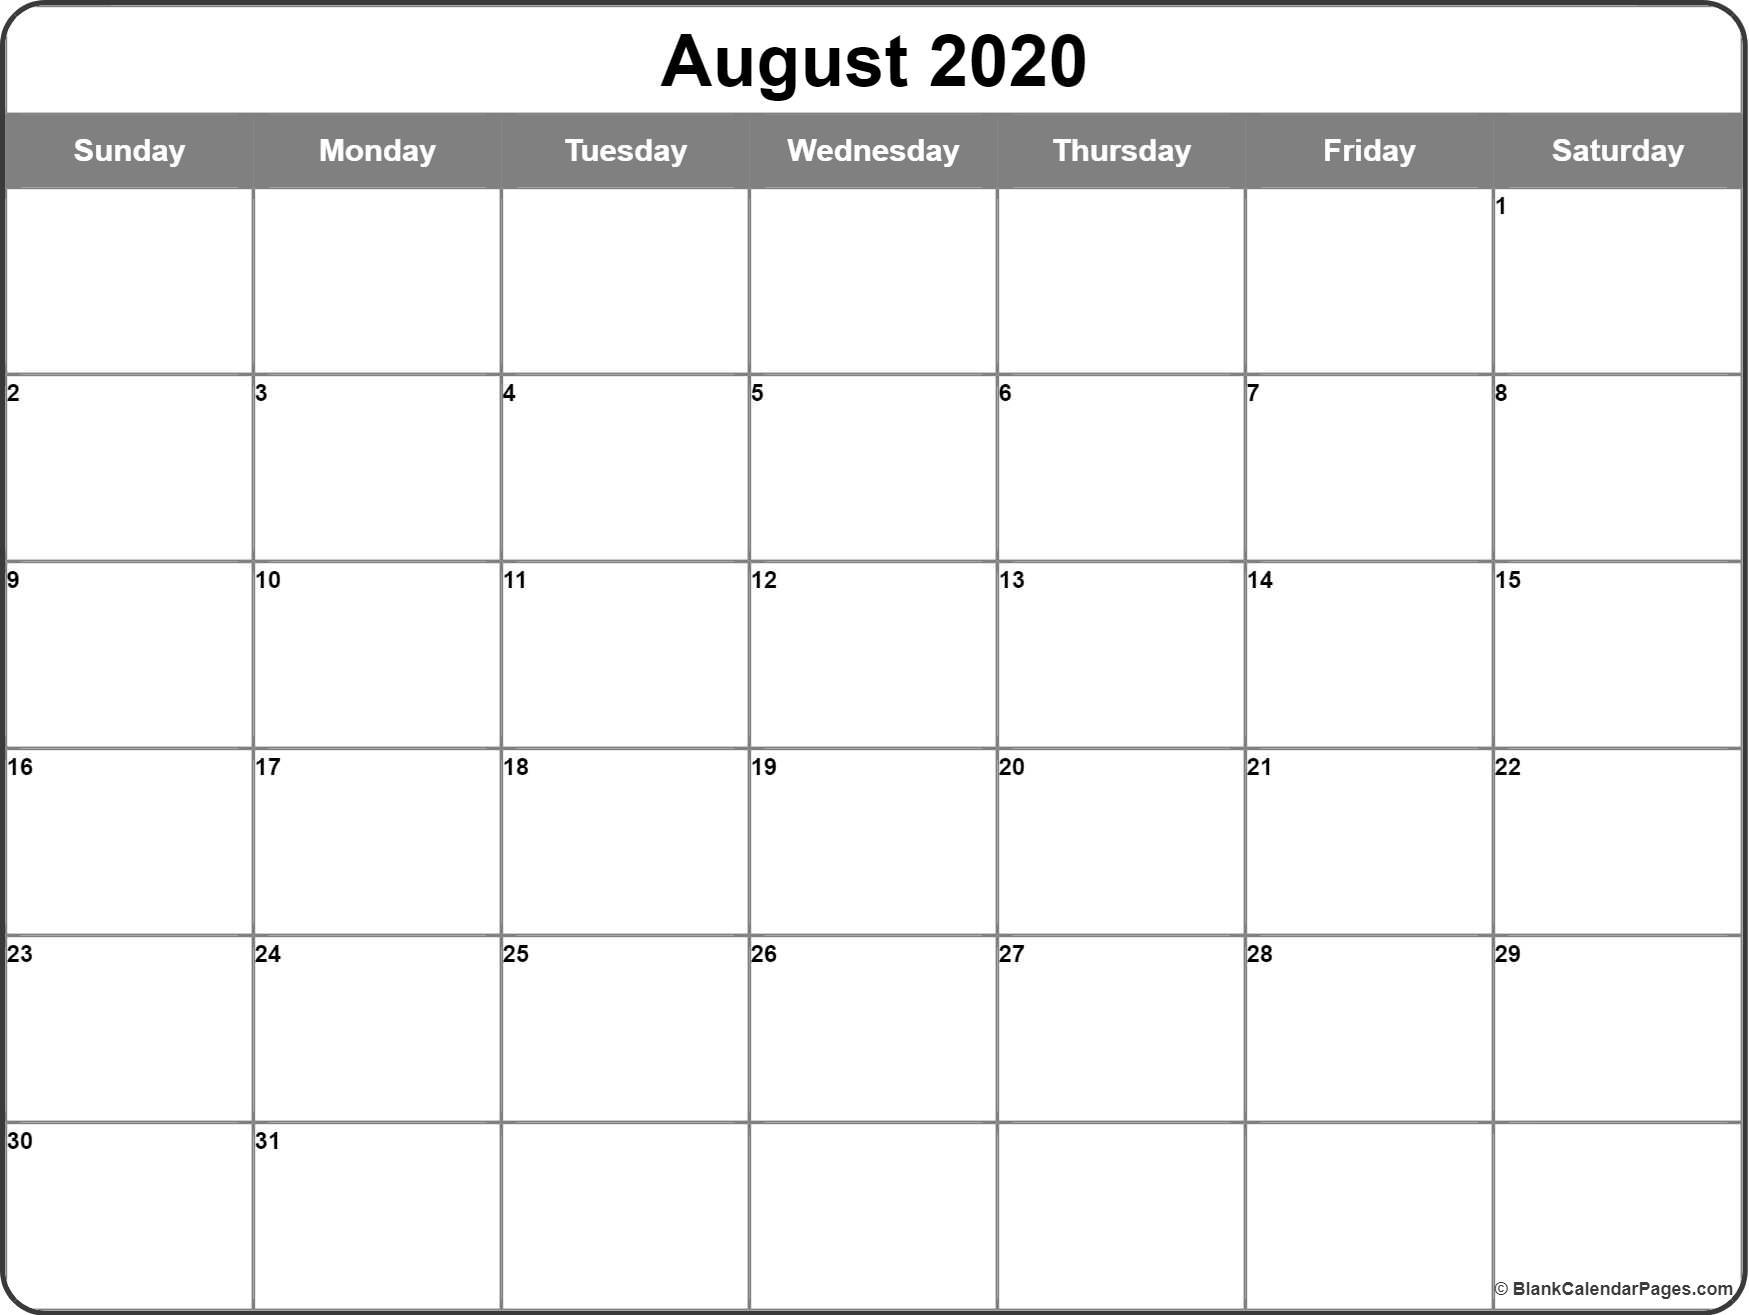 August 2020 Calendar | Free Printable Monthly Calendars pertaining to Printable Calendar Large Box 2020